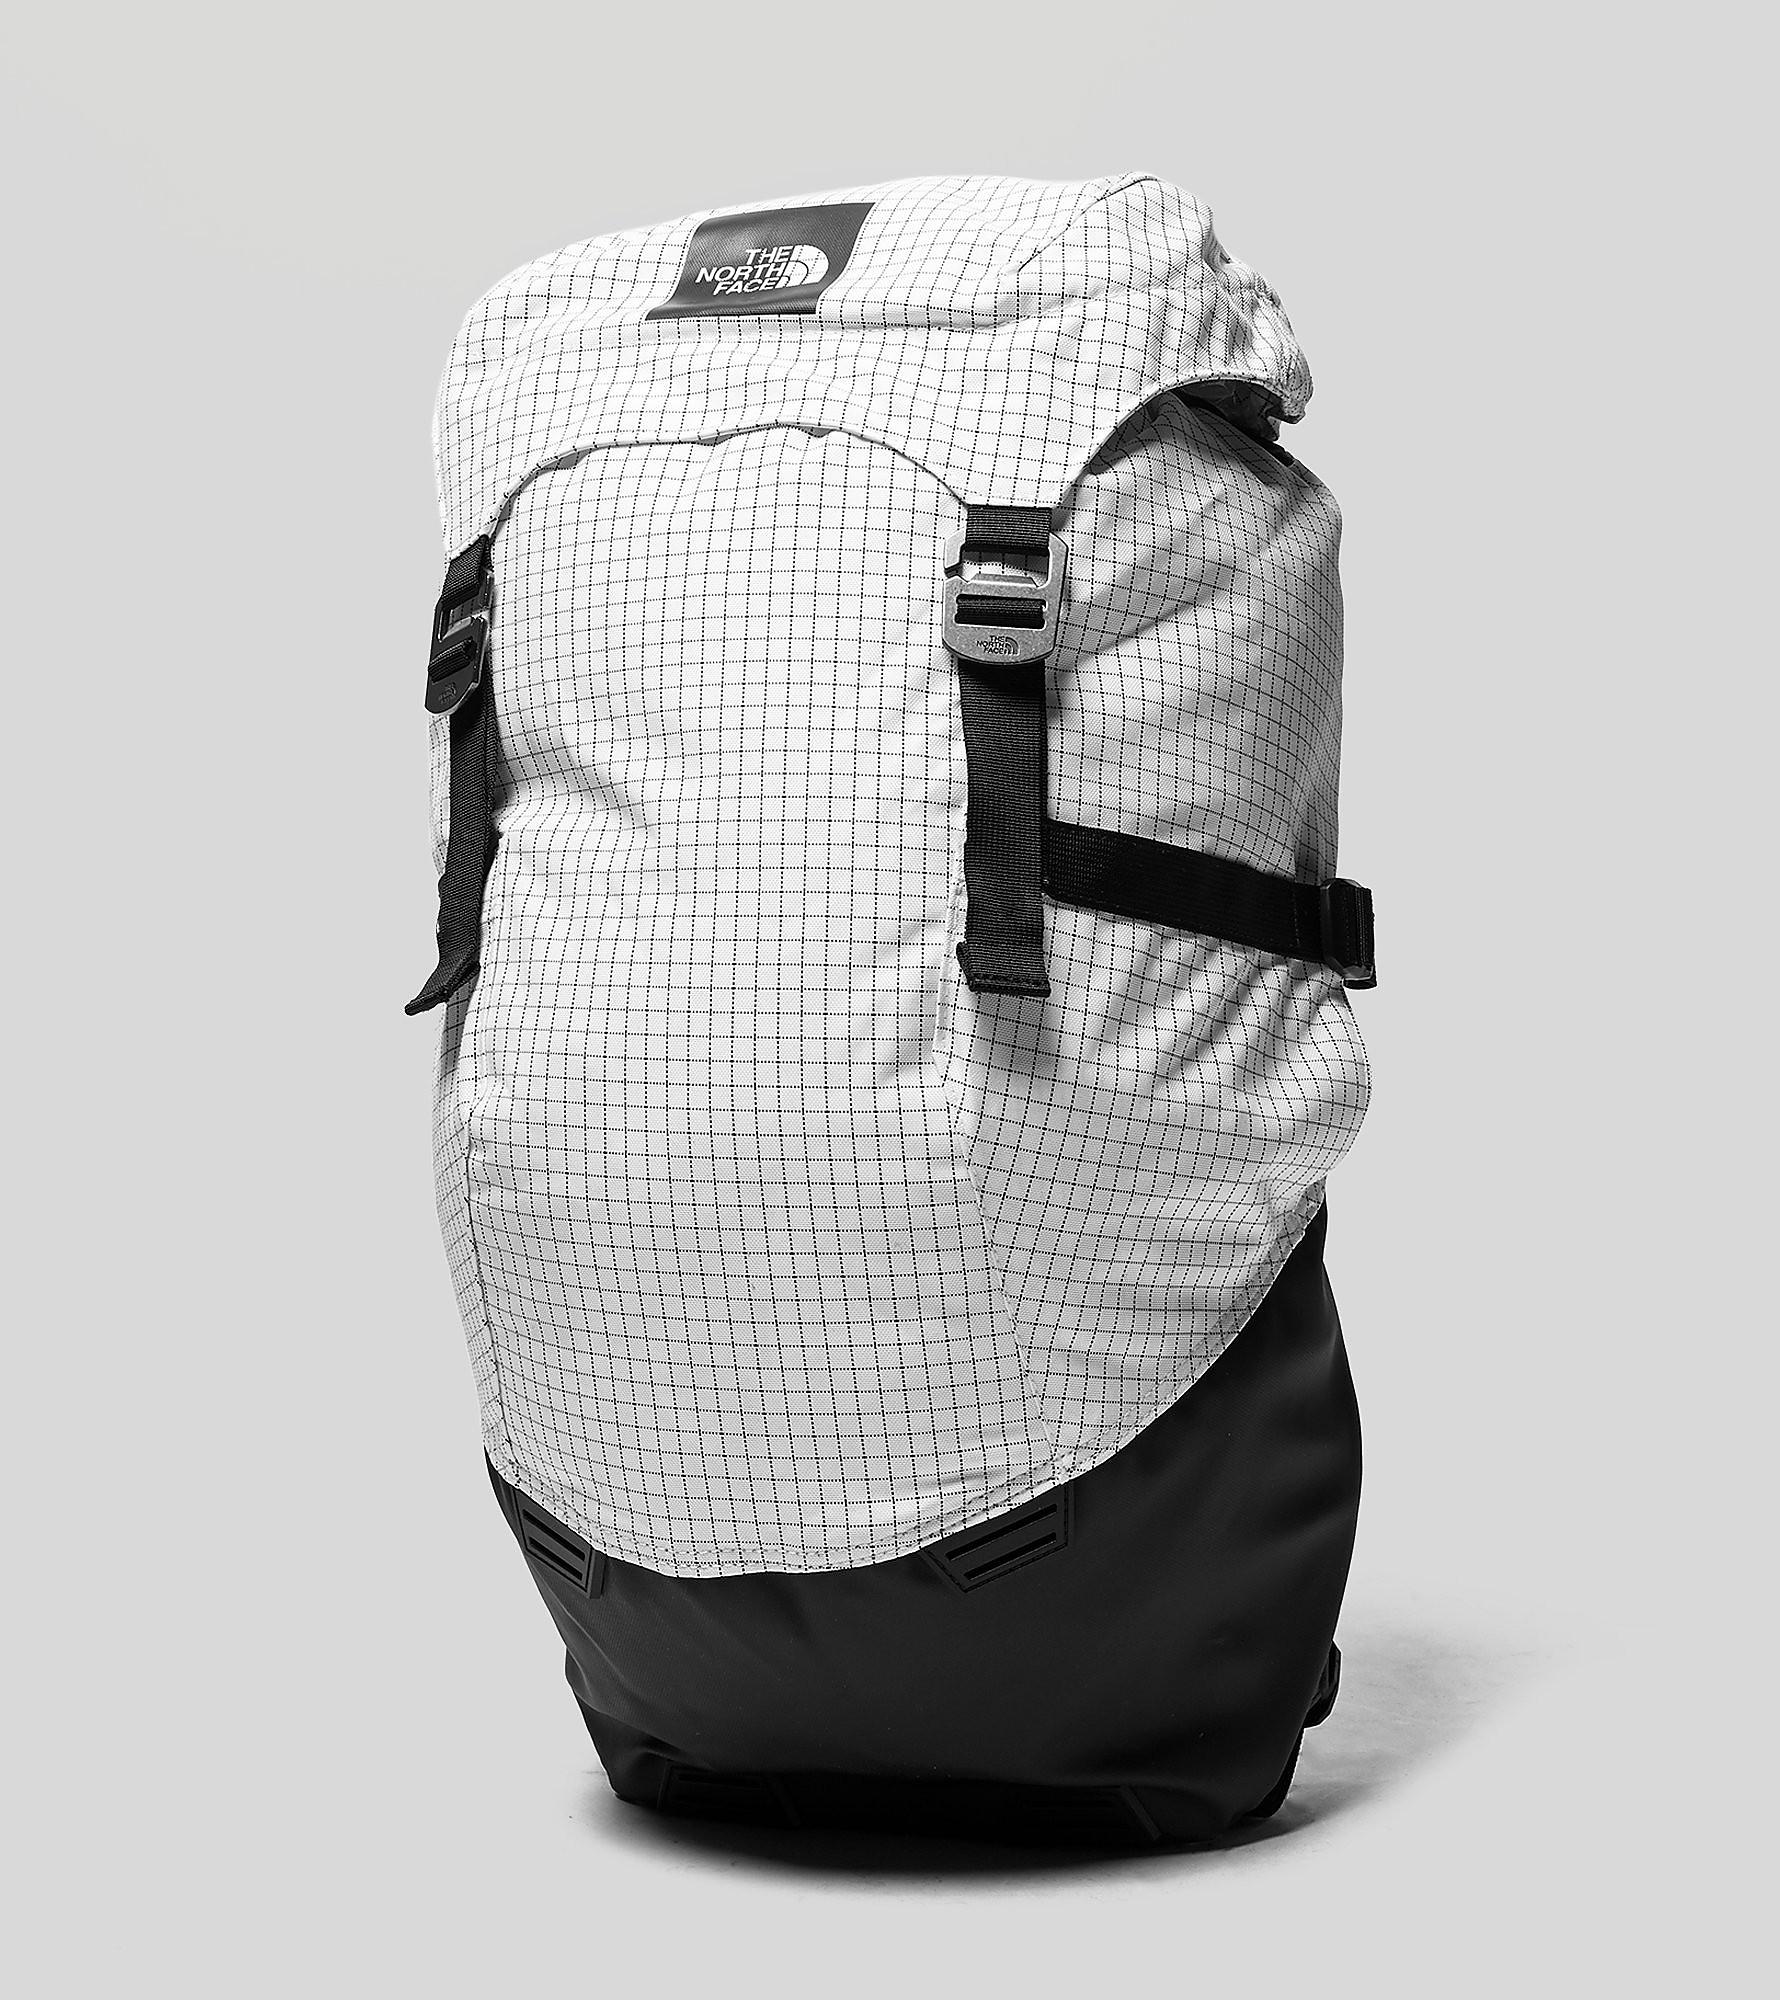 The North Face Black Label Homestead Roadtripper Backpack